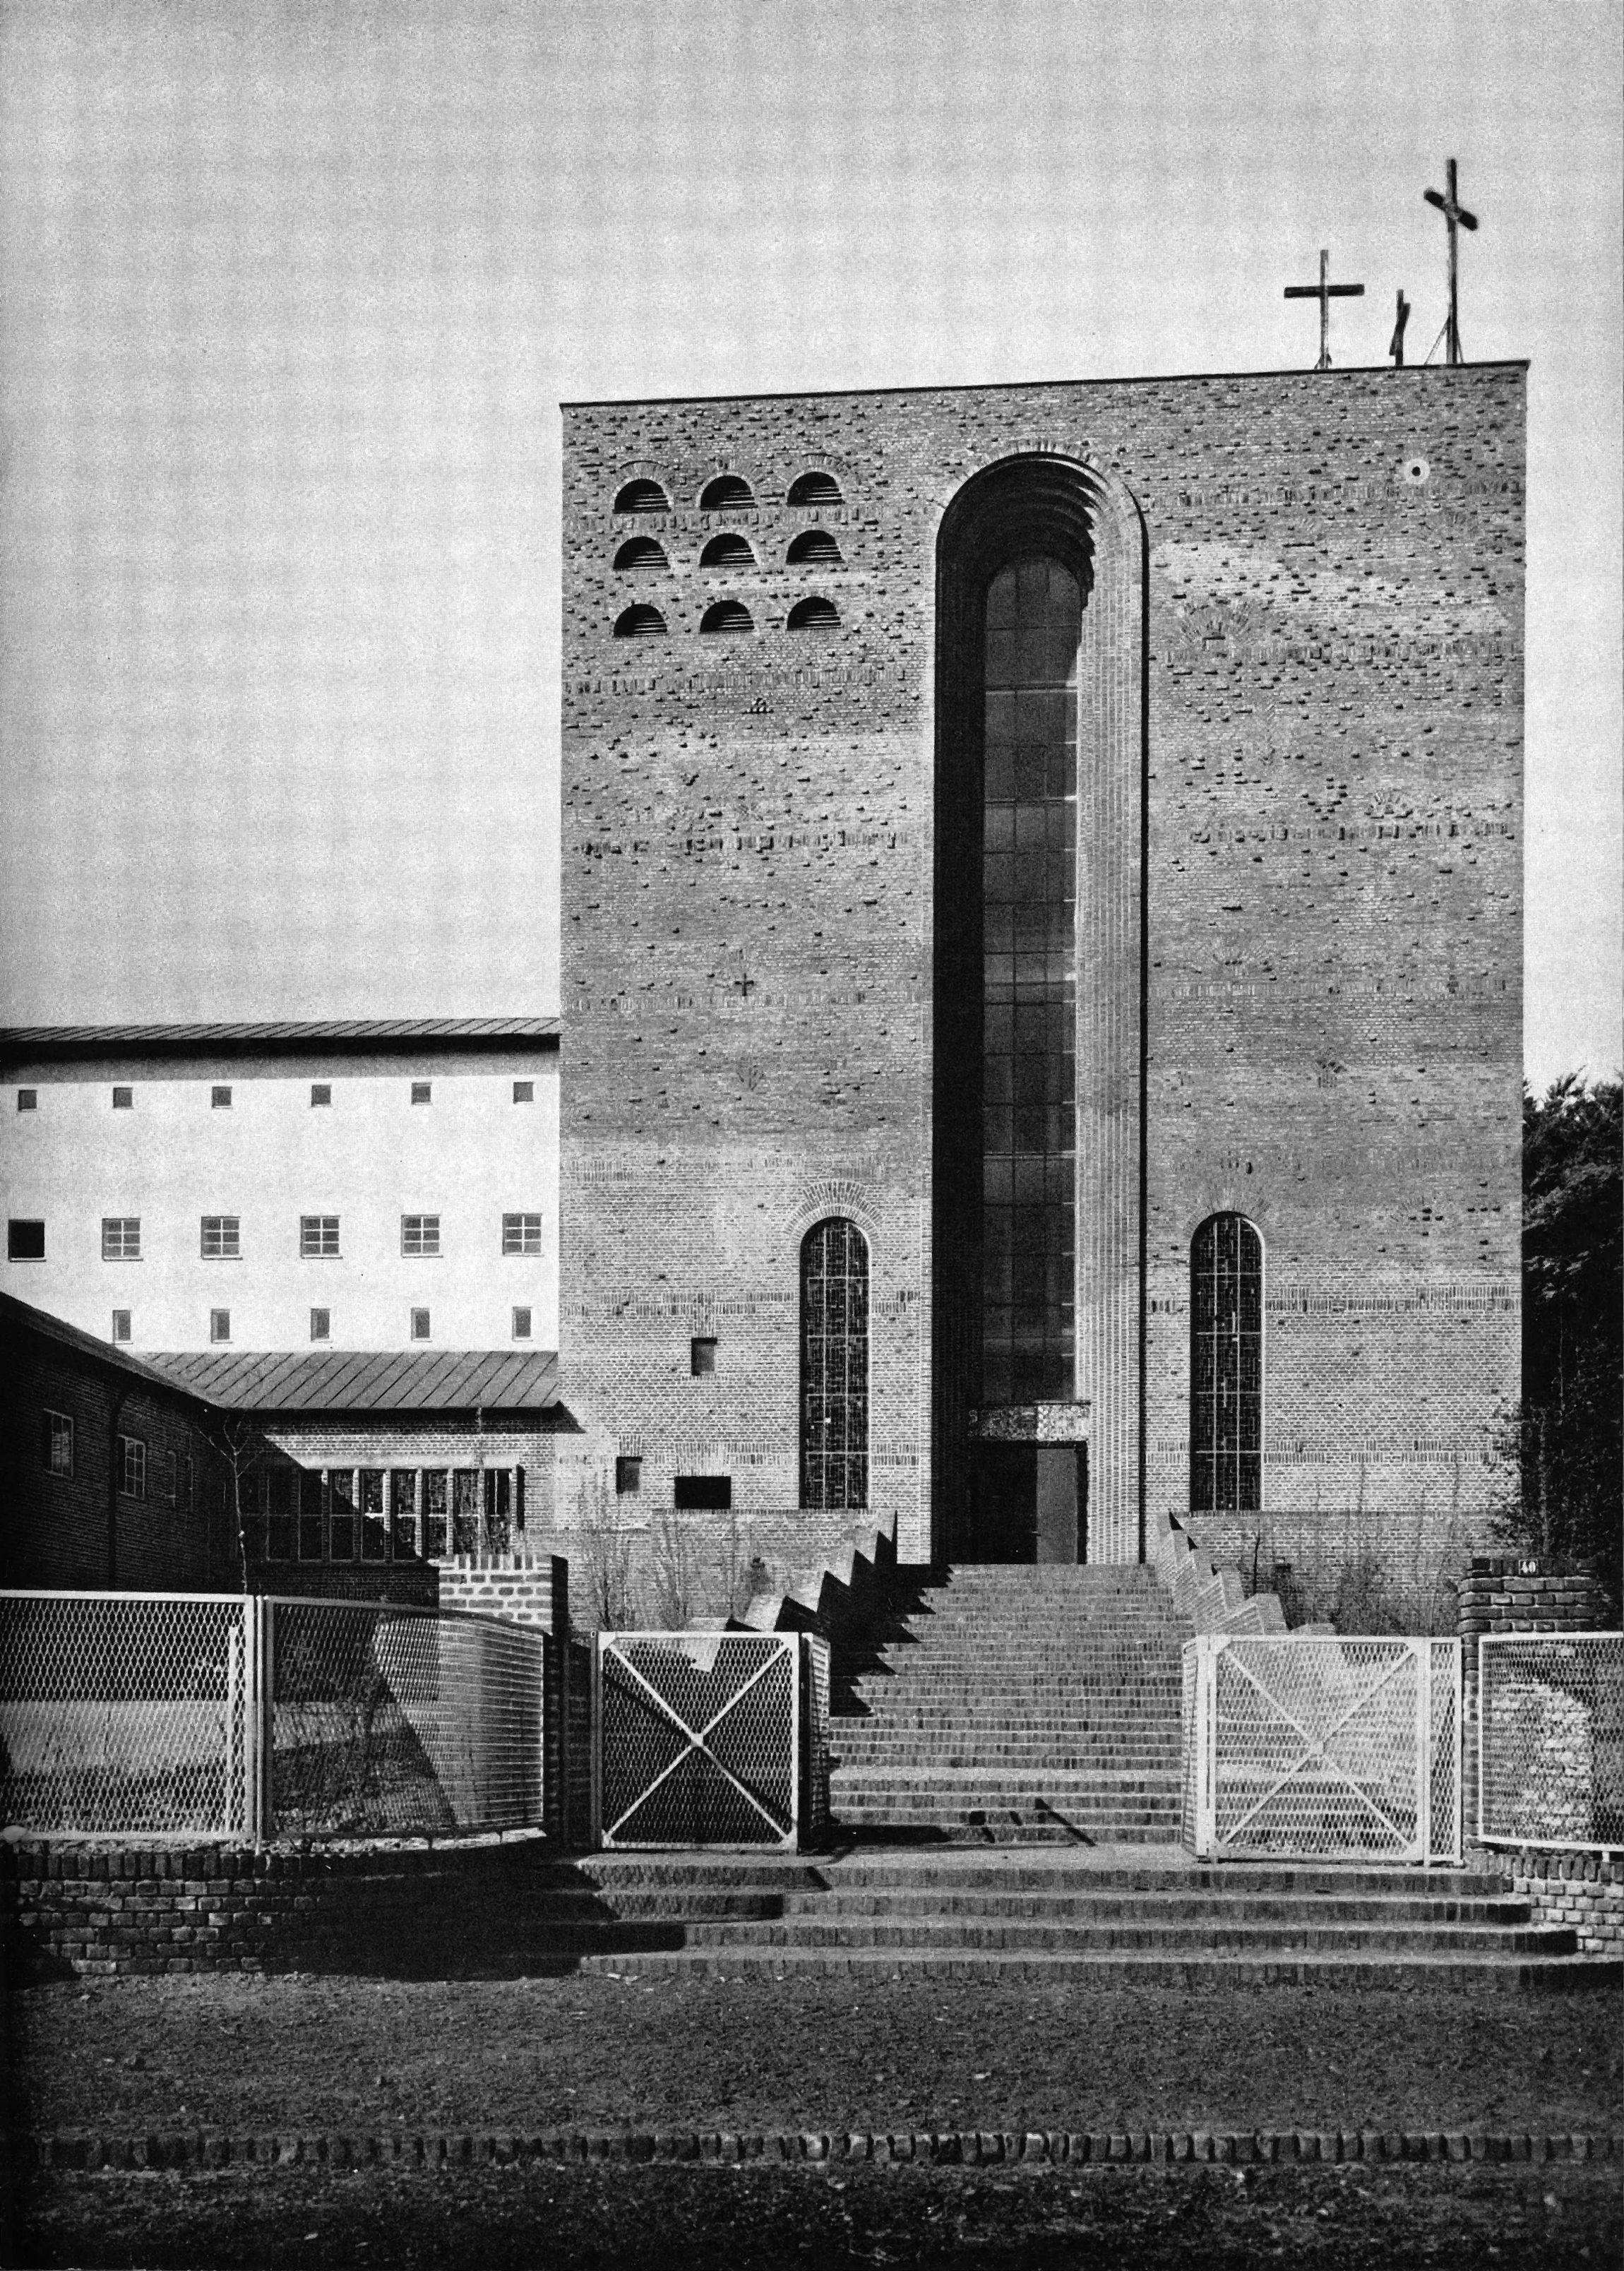 Architekt Mönchengladbach kirche st kamillus in mönchengladbach architekt dominikus böhm